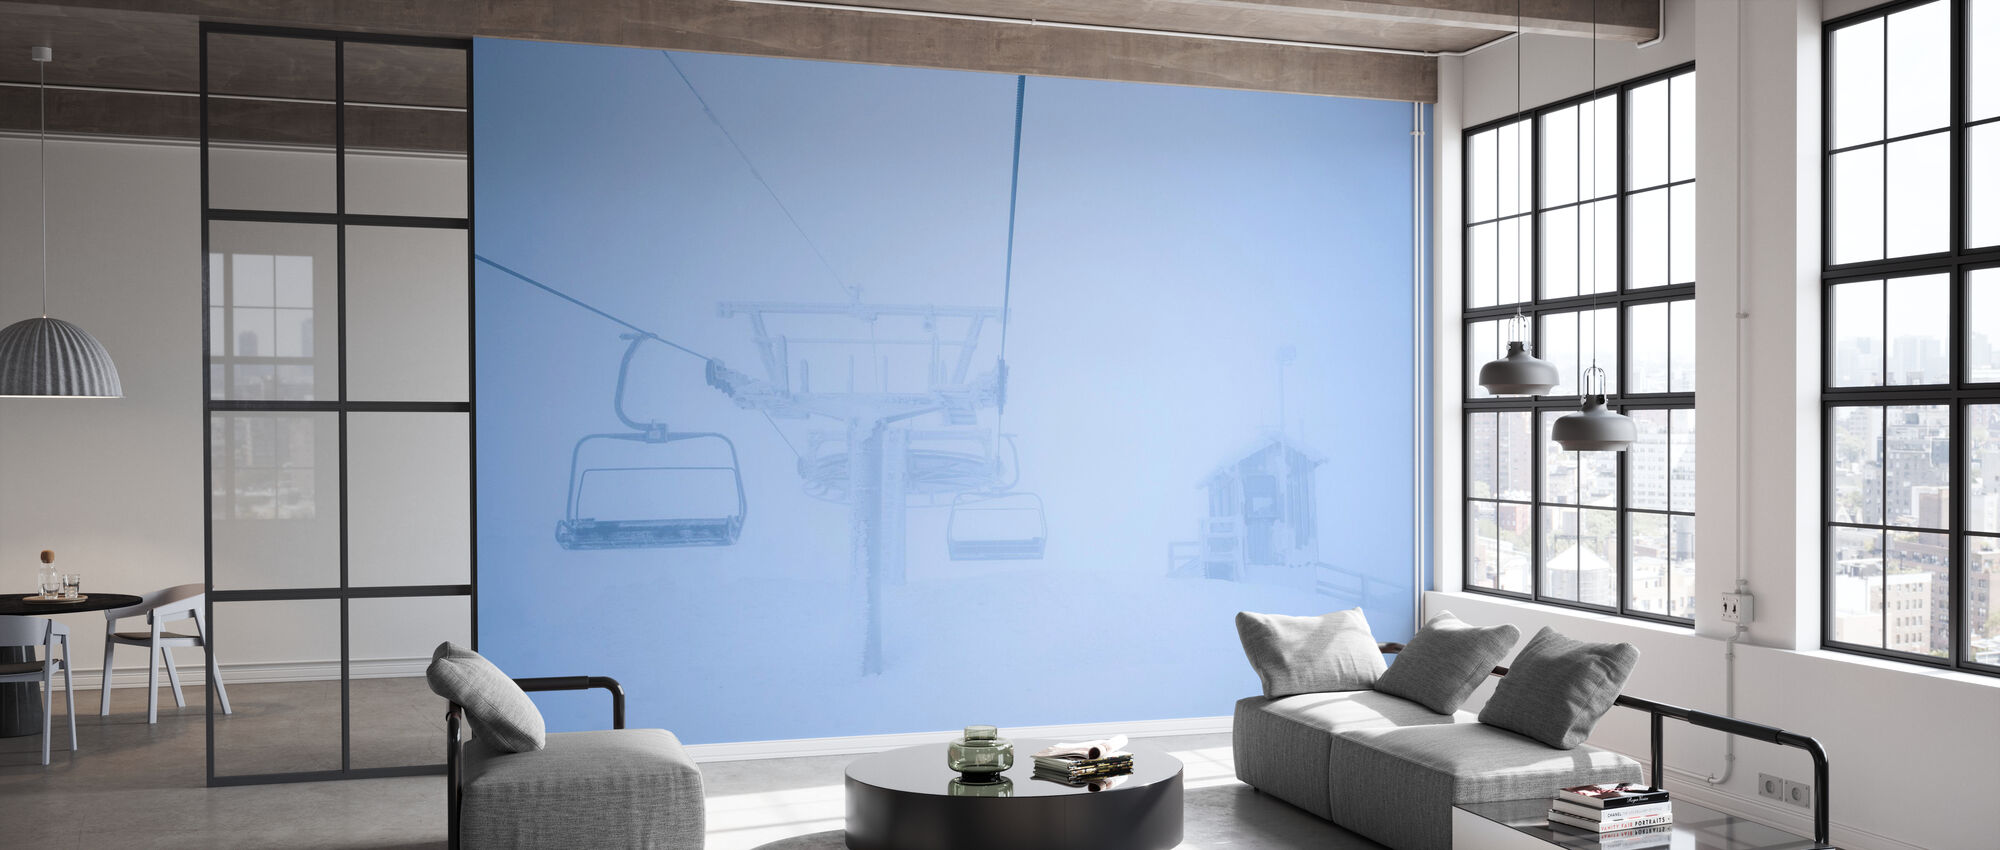 Empty Ski Lifts - Wallpaper - Office